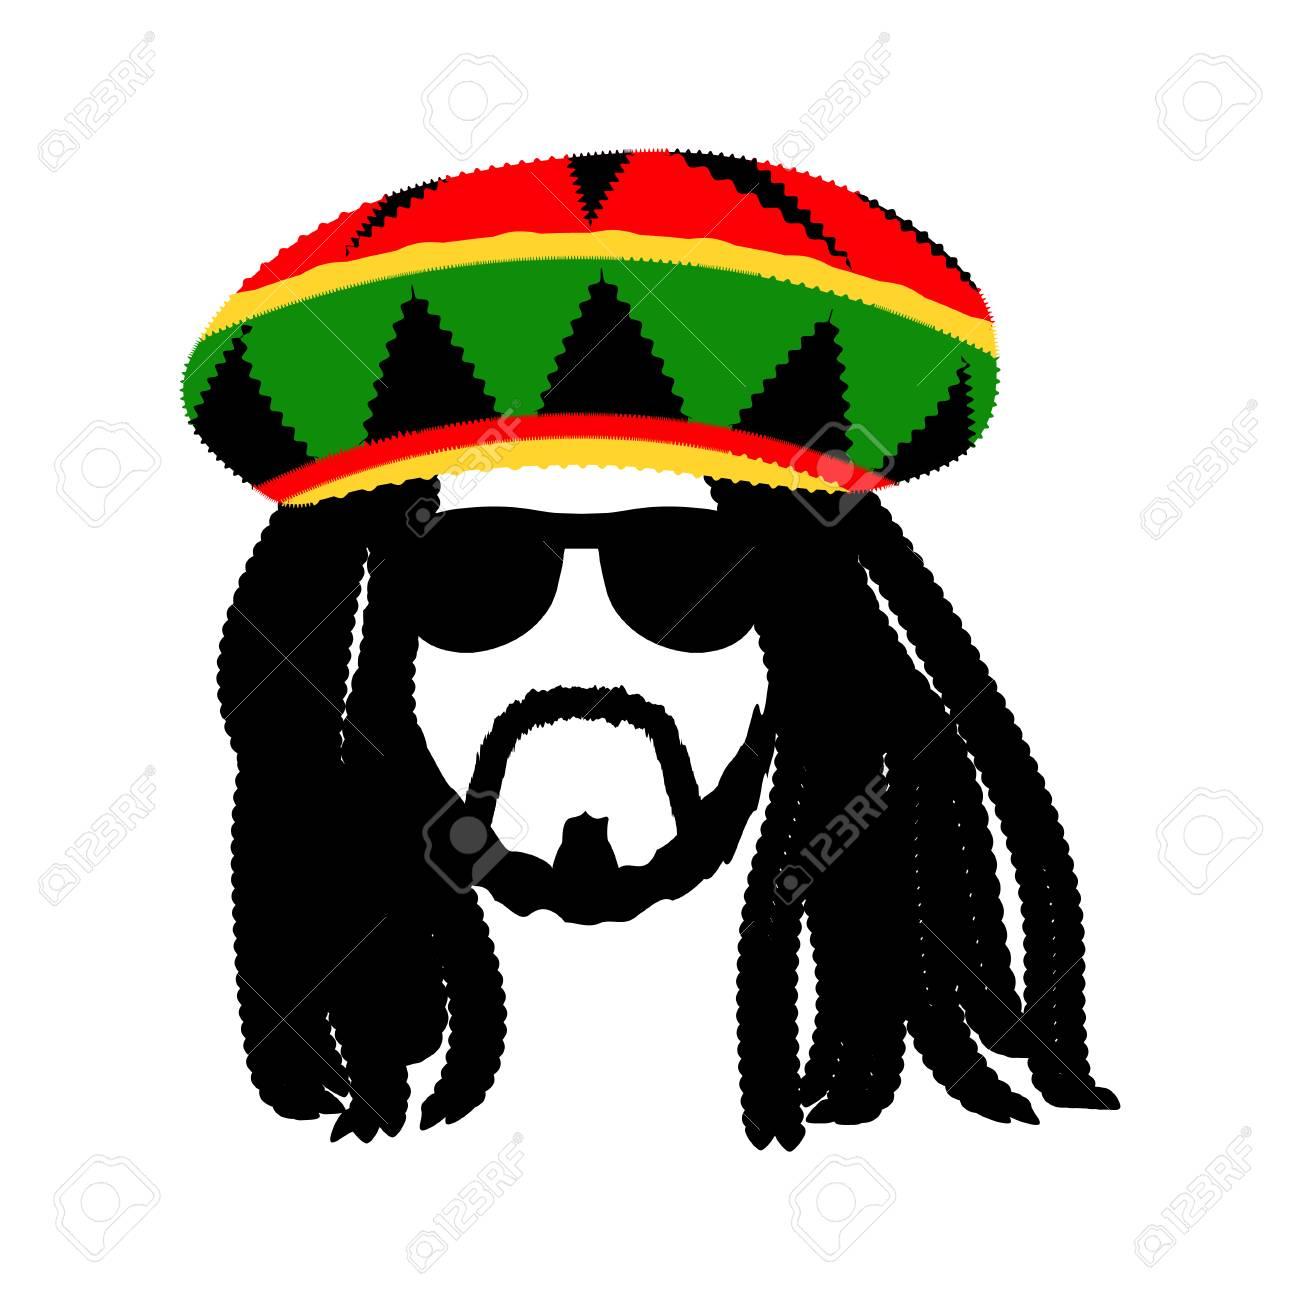 dcbd64c0b97 Photo jamaican rasta hat with dreadlocks and beard reggae style avatar  isolated on white background vector